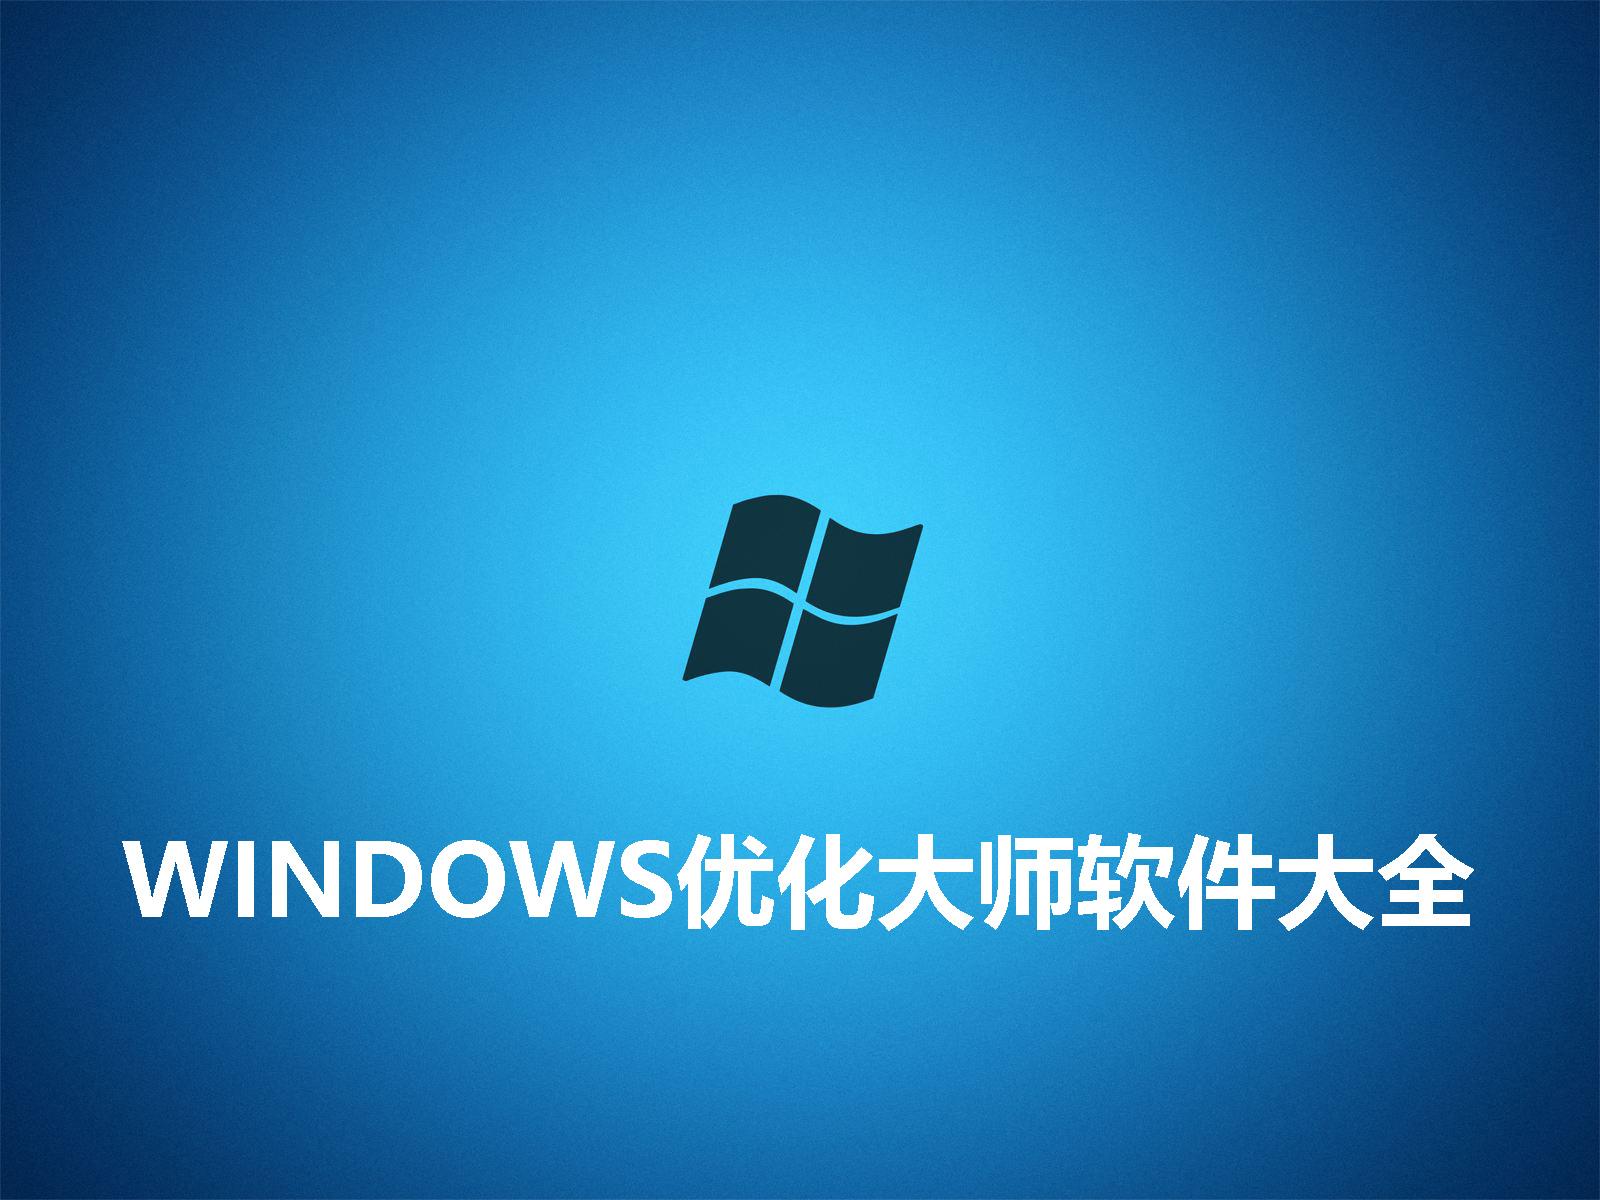 WINDOWS优化大师百胜线上娱乐大全